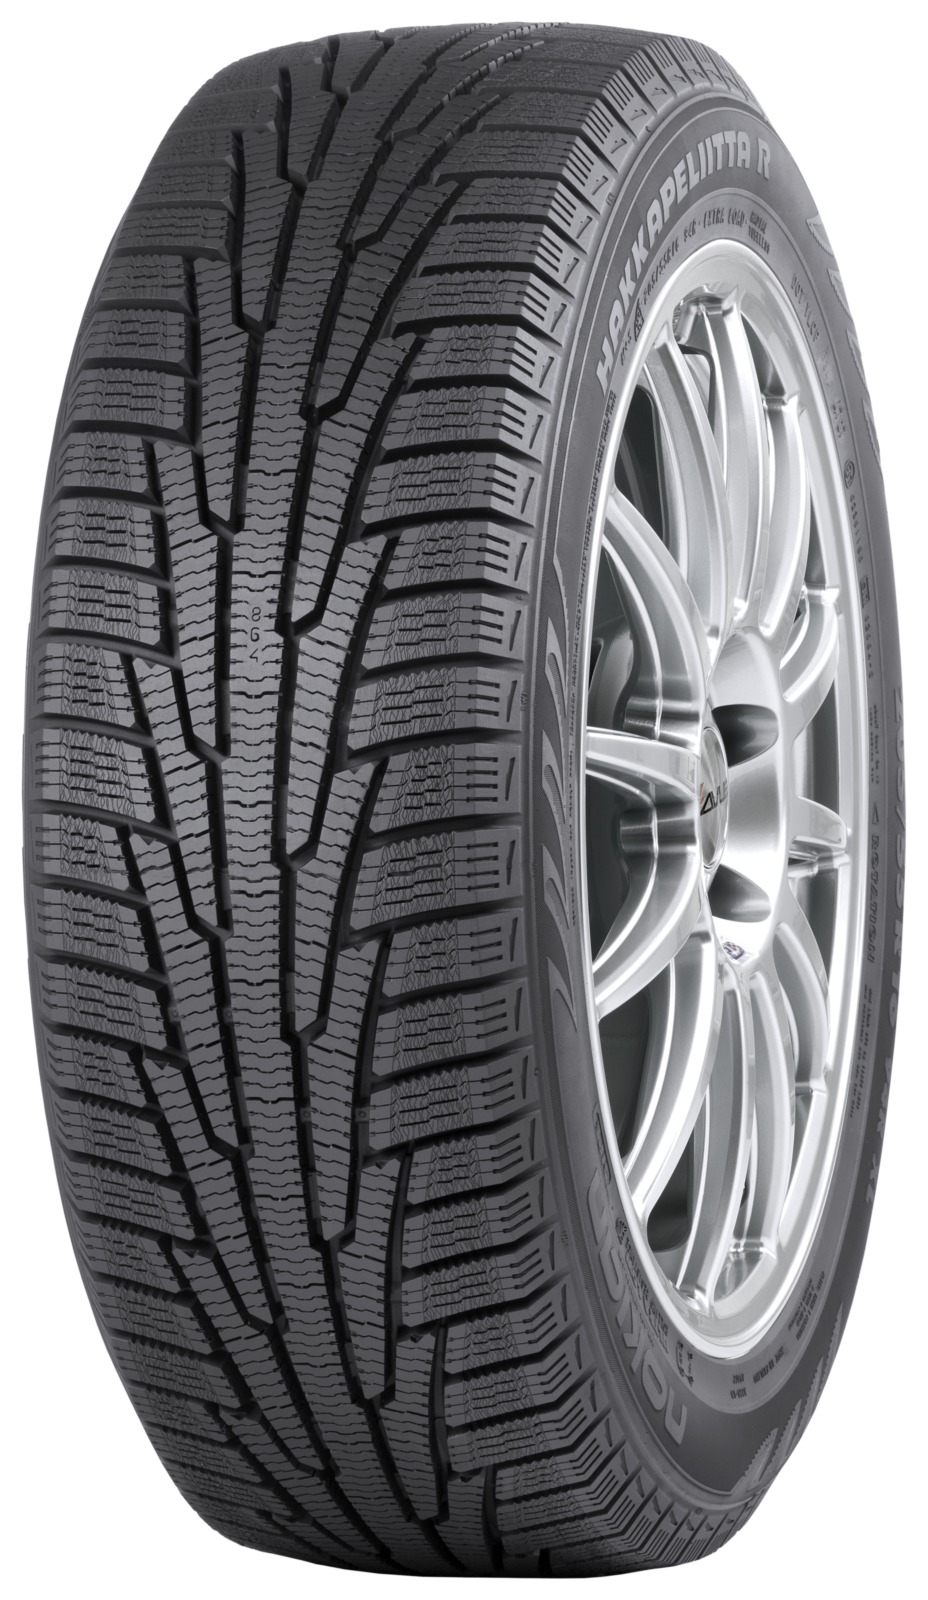 Nexen Tires Reviews >> Purchase Decision – Winter Tires – Part 1 | ValueCanuck.com